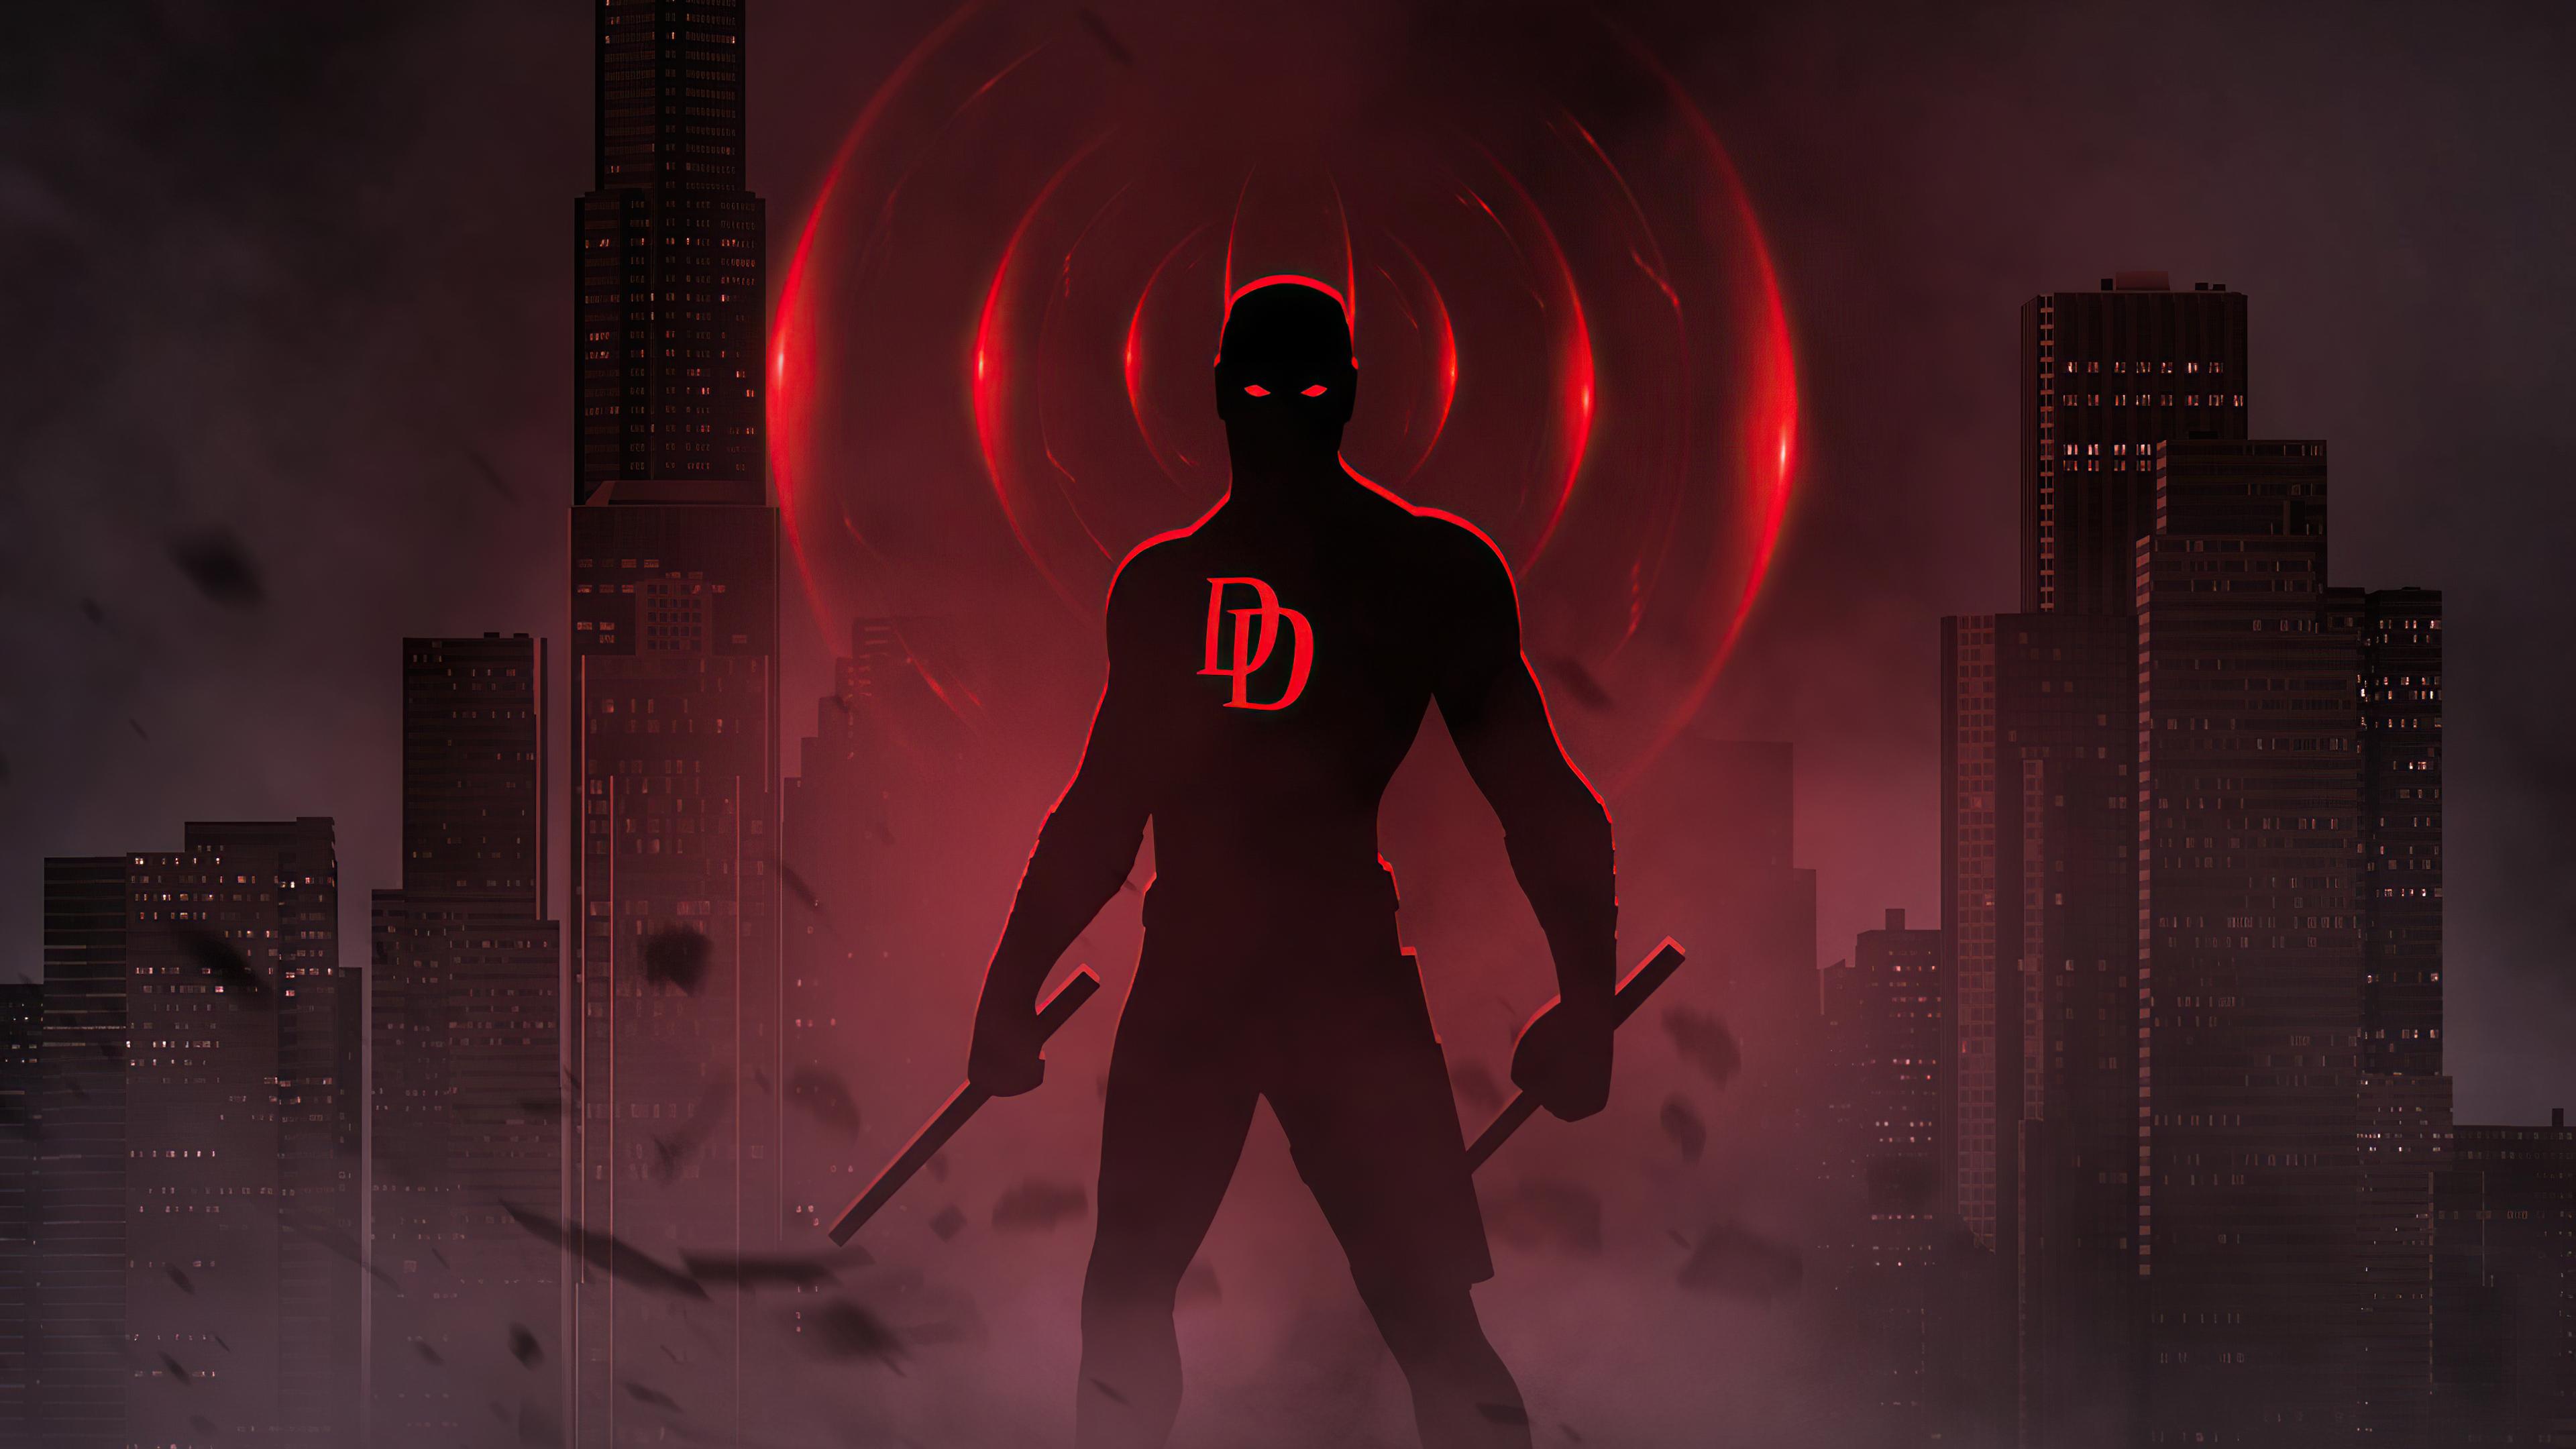 daredevil bosslogic 4k 1619216532 - Daredevil Bosslogic 4k - Daredevil Bosslogic 4k wallpapers